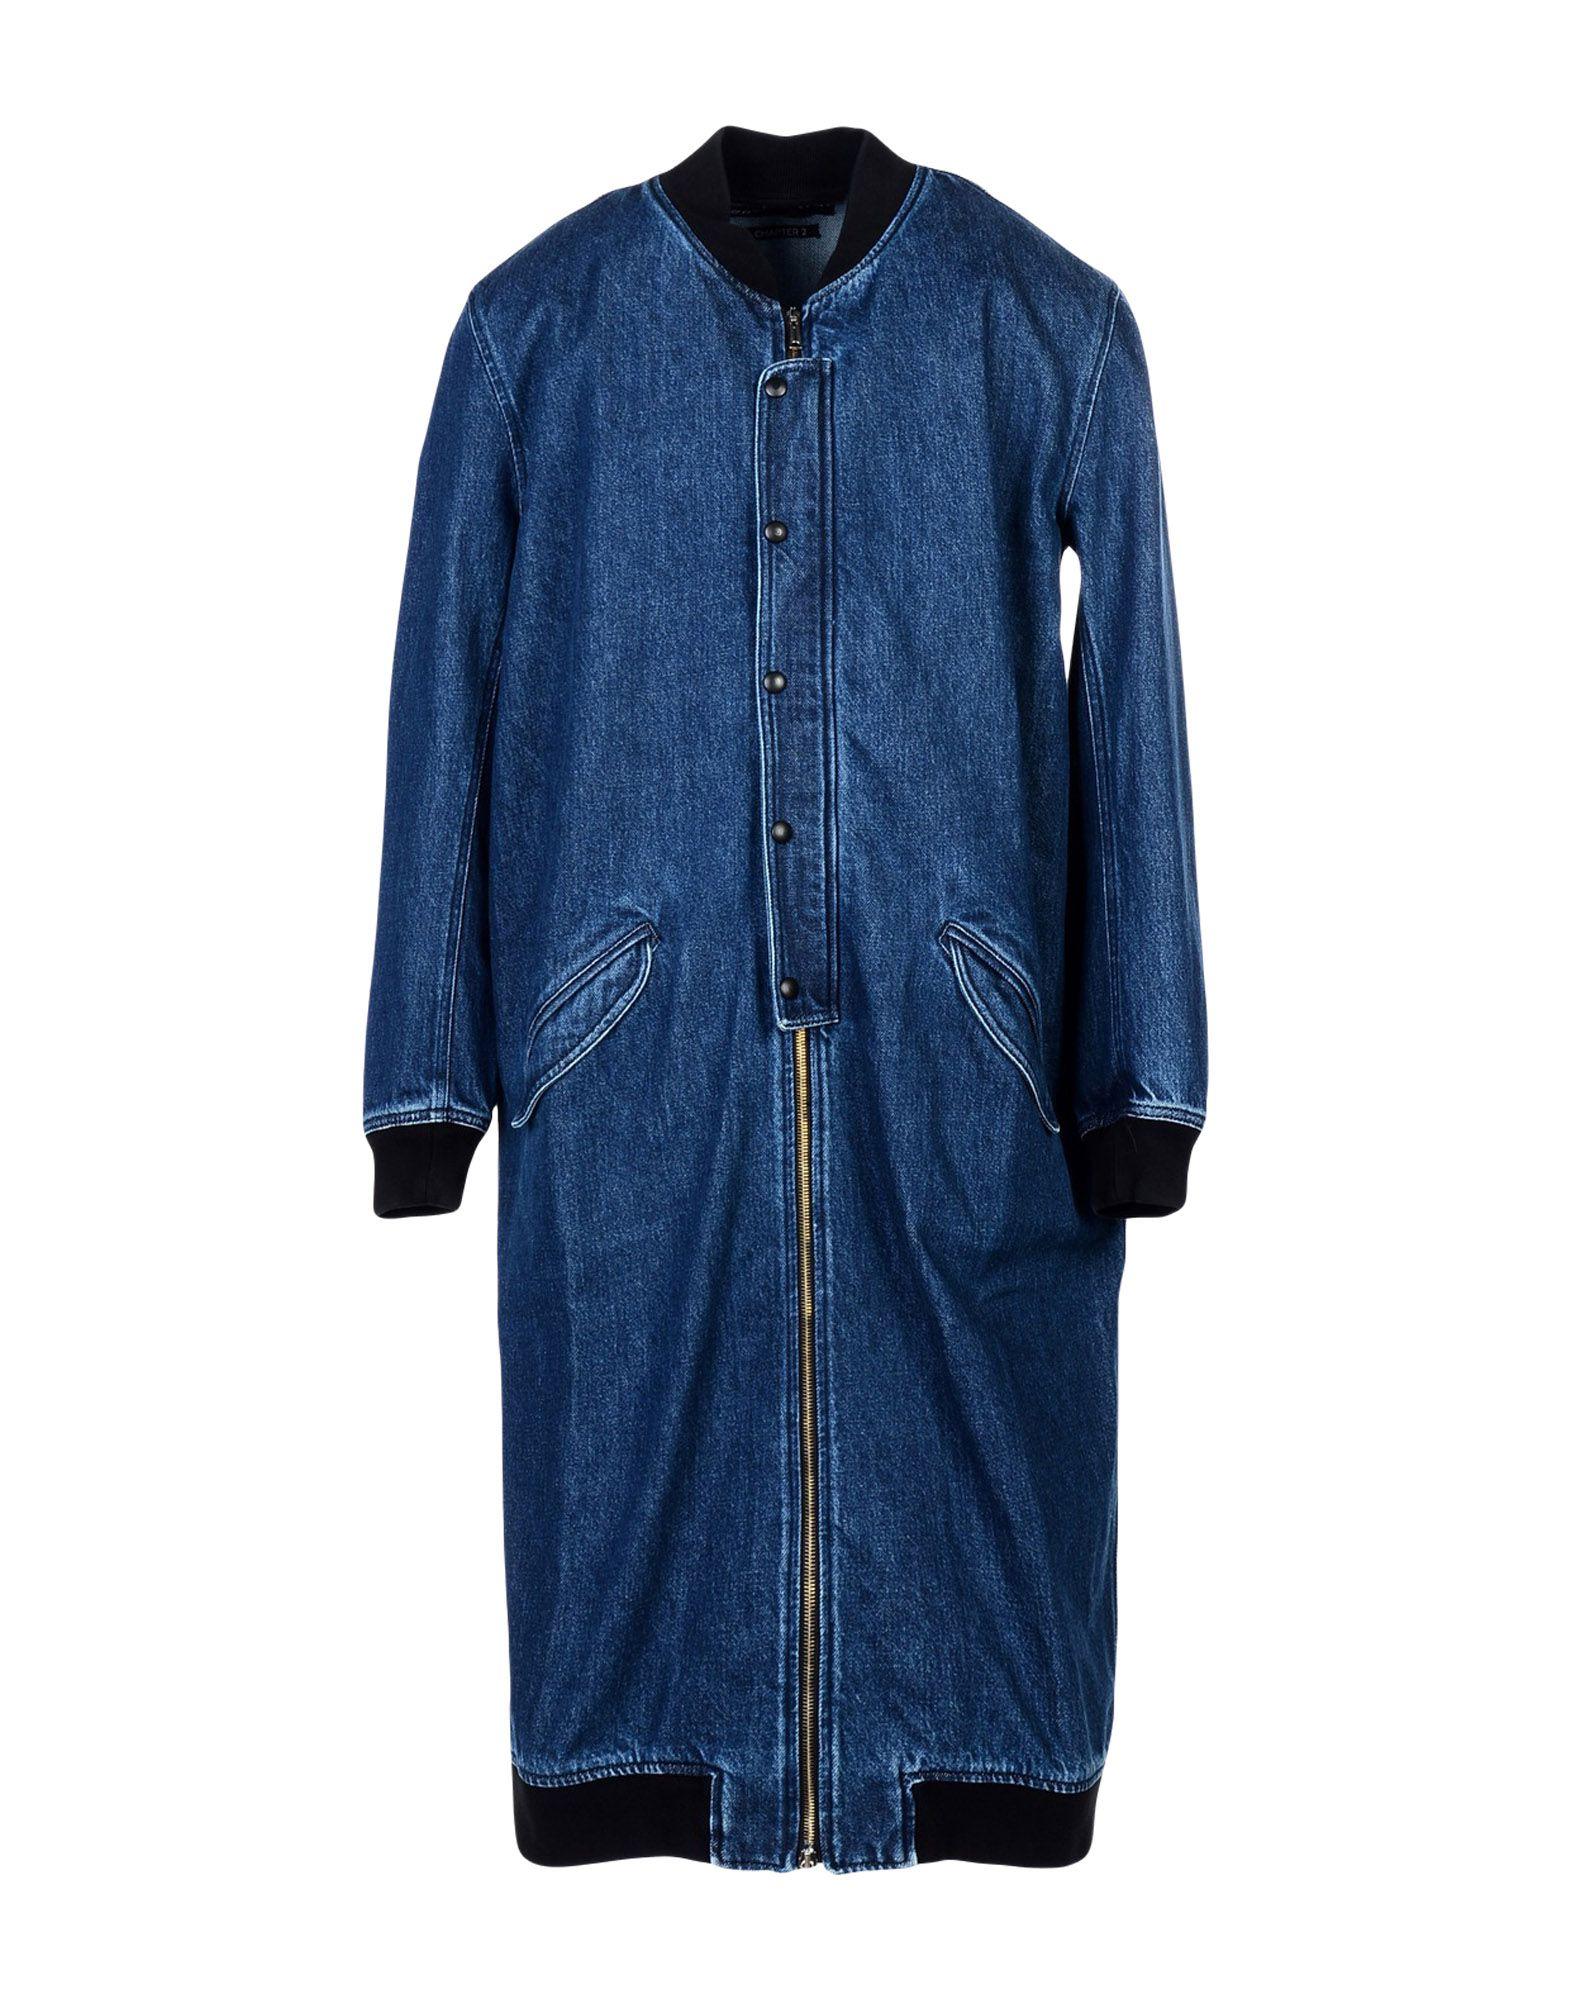 Giubbotto Jeans The Cryptonym Uomo - Acquista online su